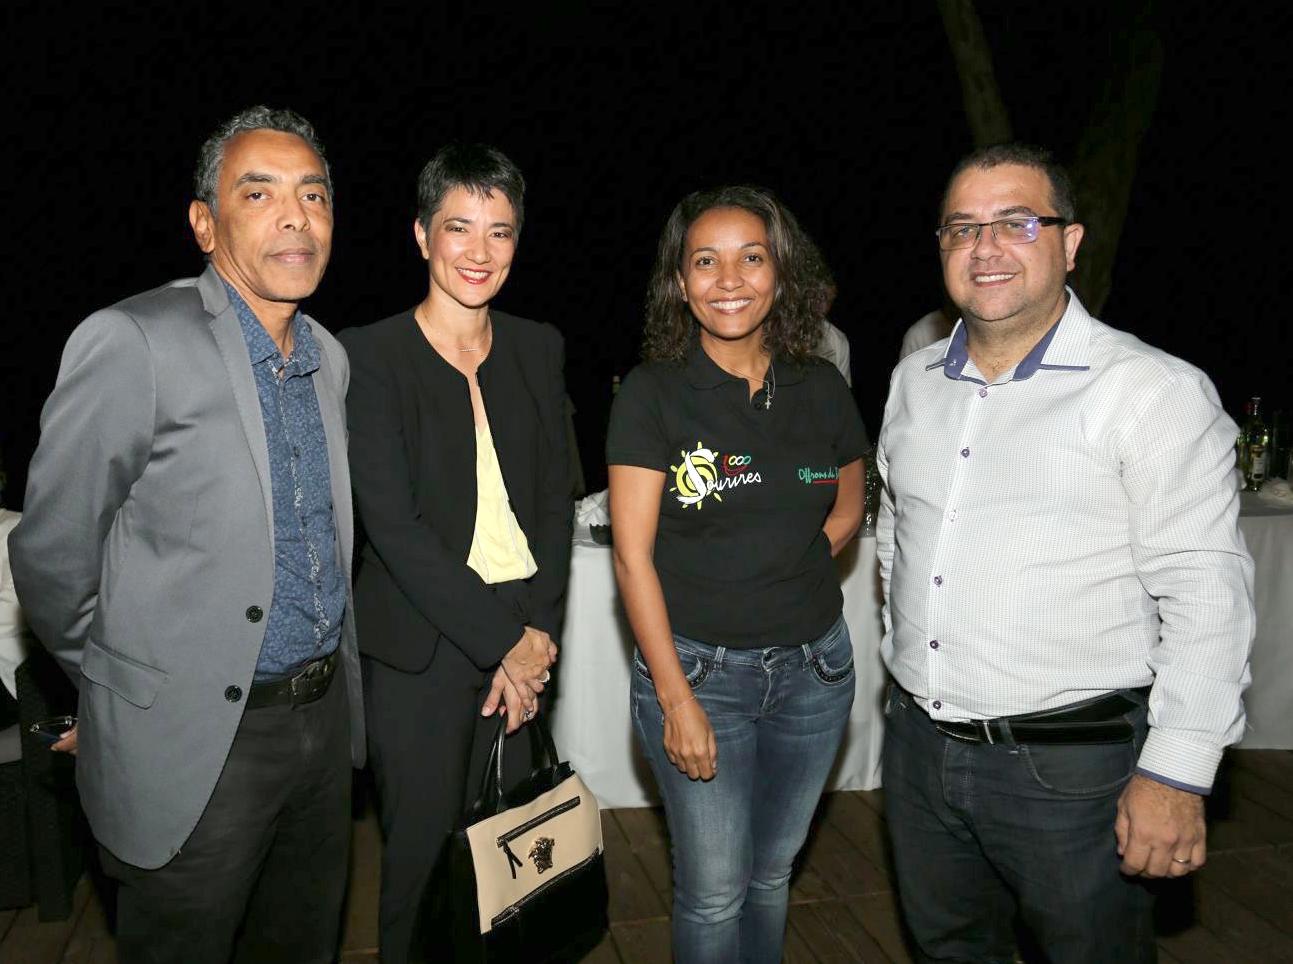 Thierry Jardinot, Carole Chane-Ki-Chune, Marie-Alice Sinaman, et Eric Fontaine,